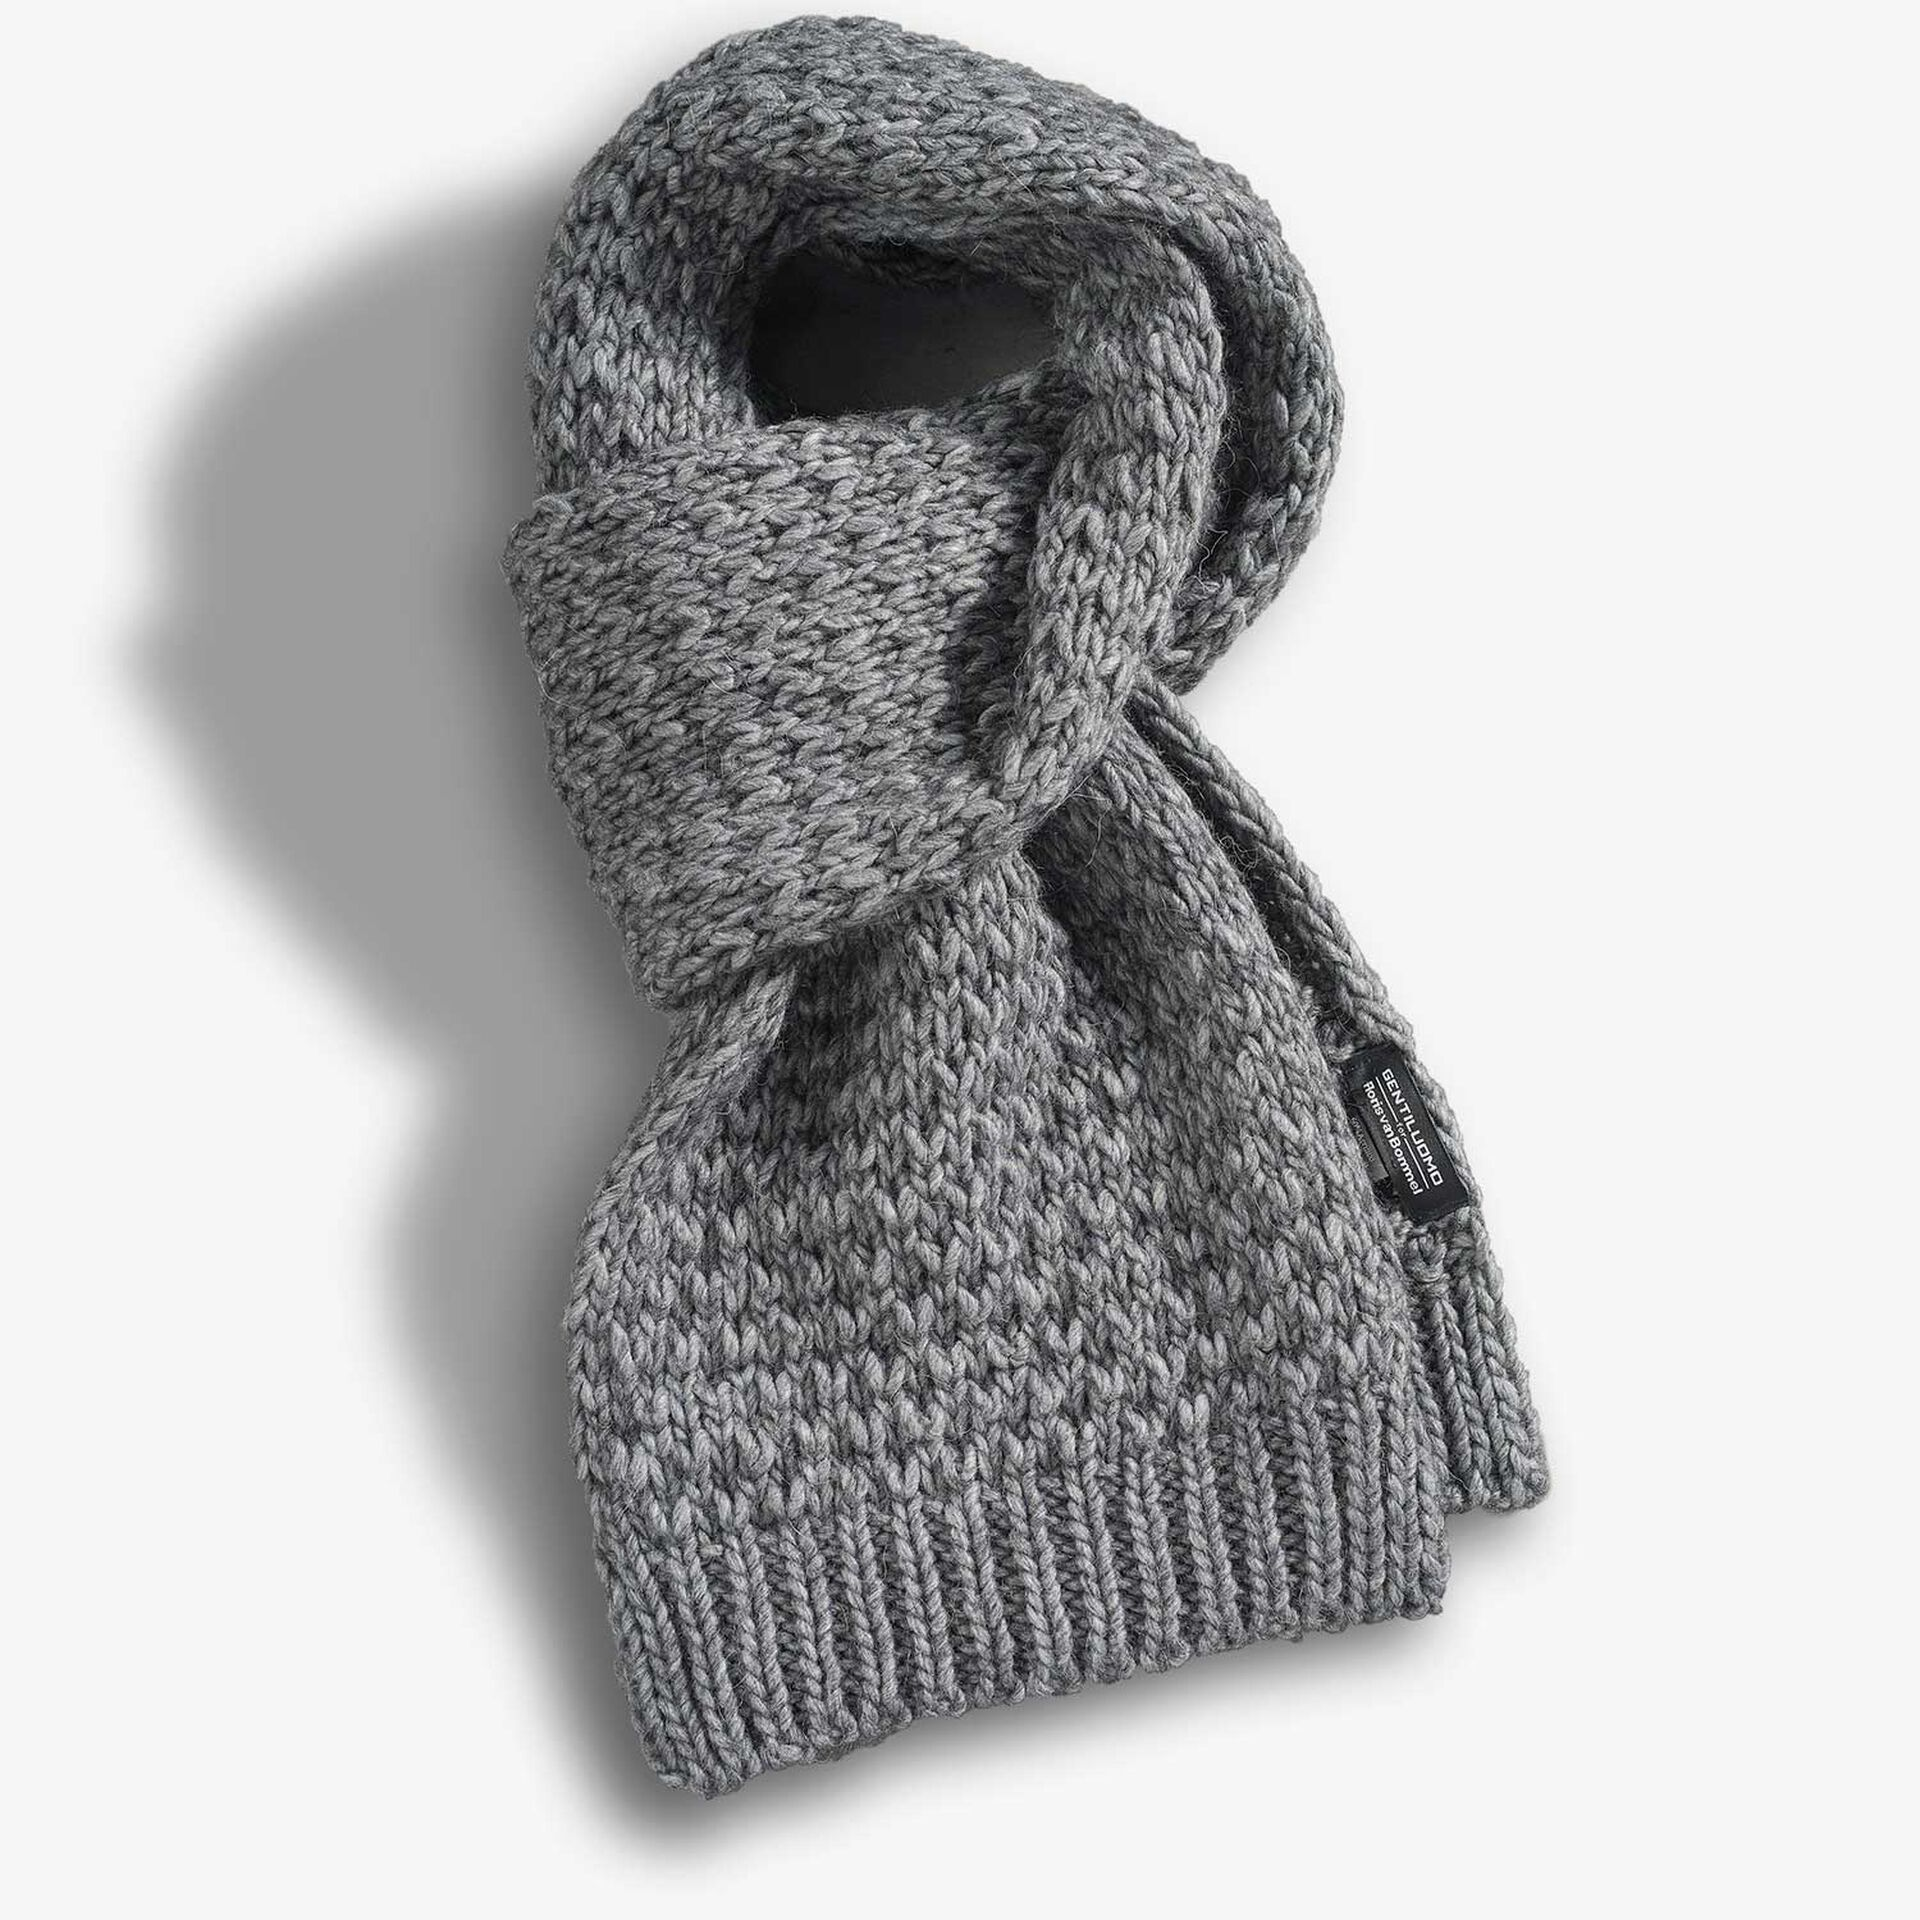 Floris van Bommel's Favourites scarf 'Gentiluomo for Floris van Bommel'